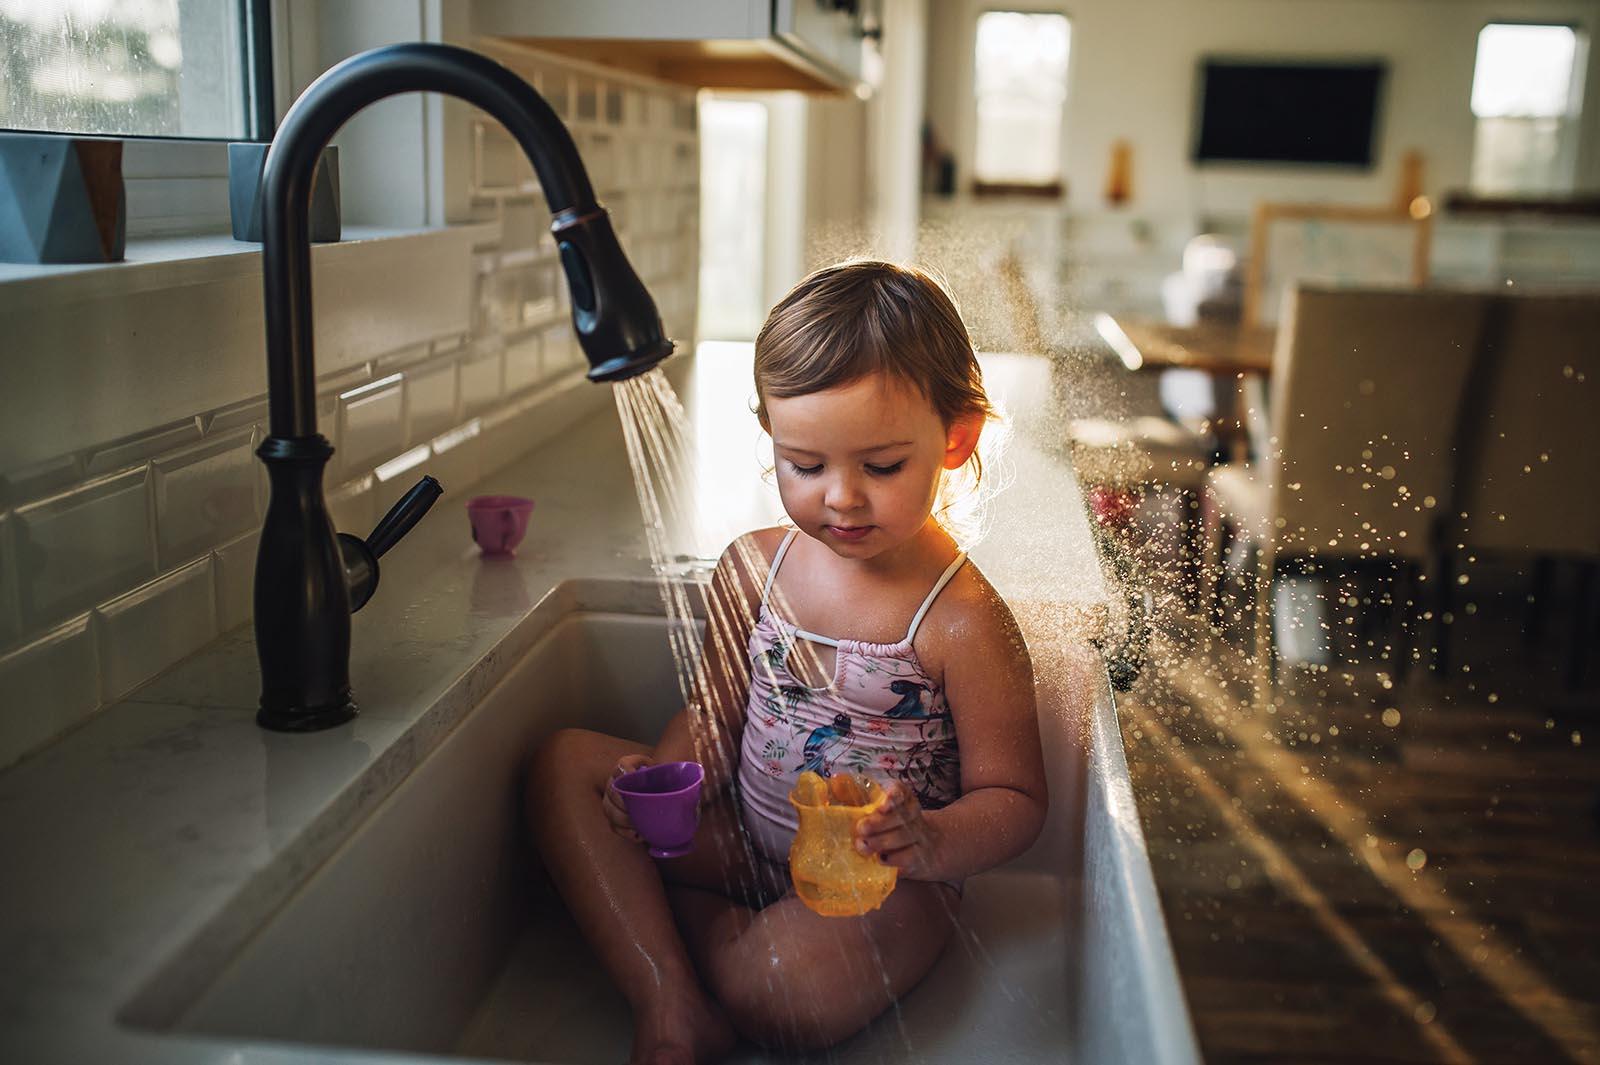 Baby plays in sink in window light